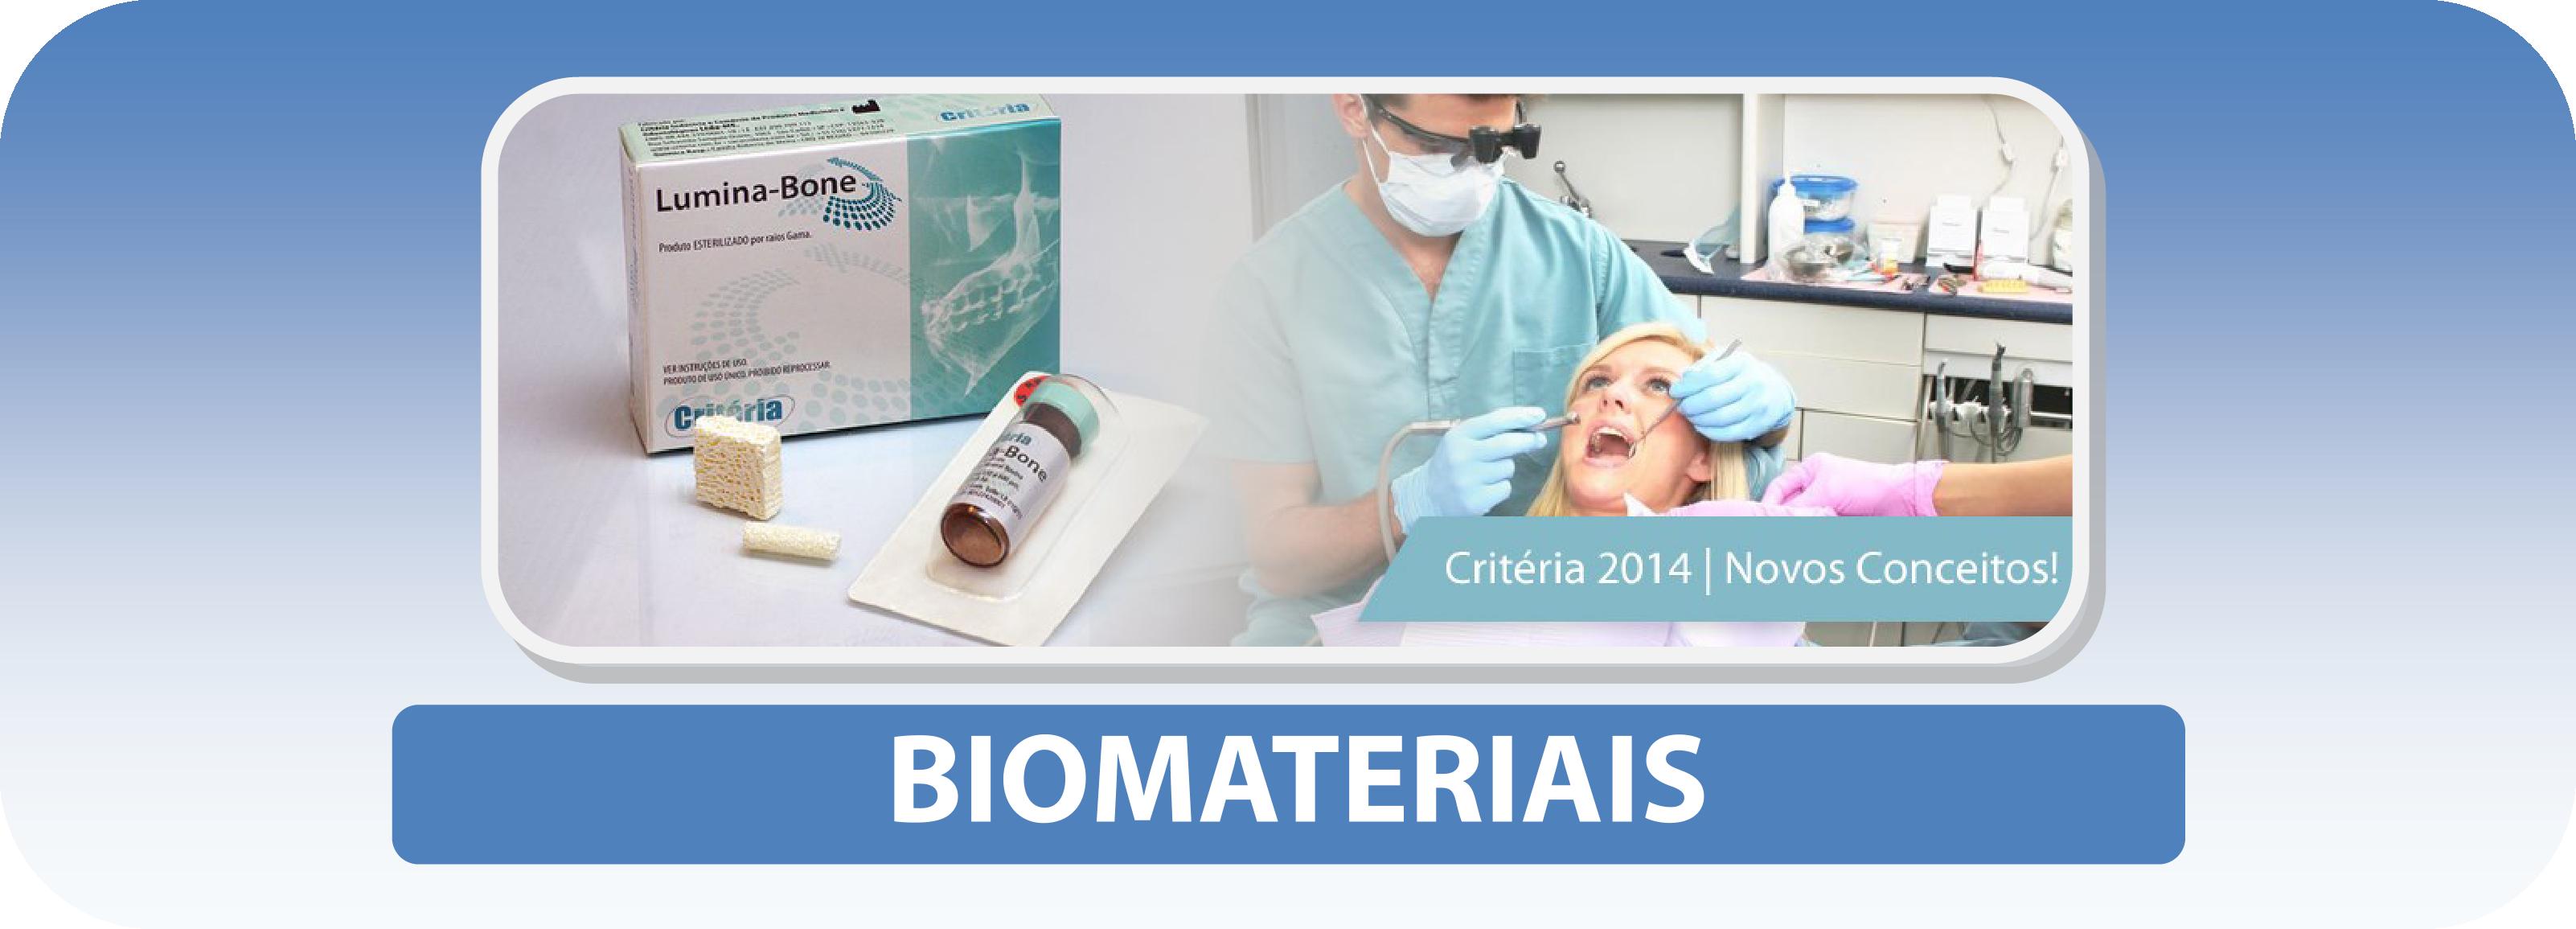 BIOMATERIAISFINAL.png